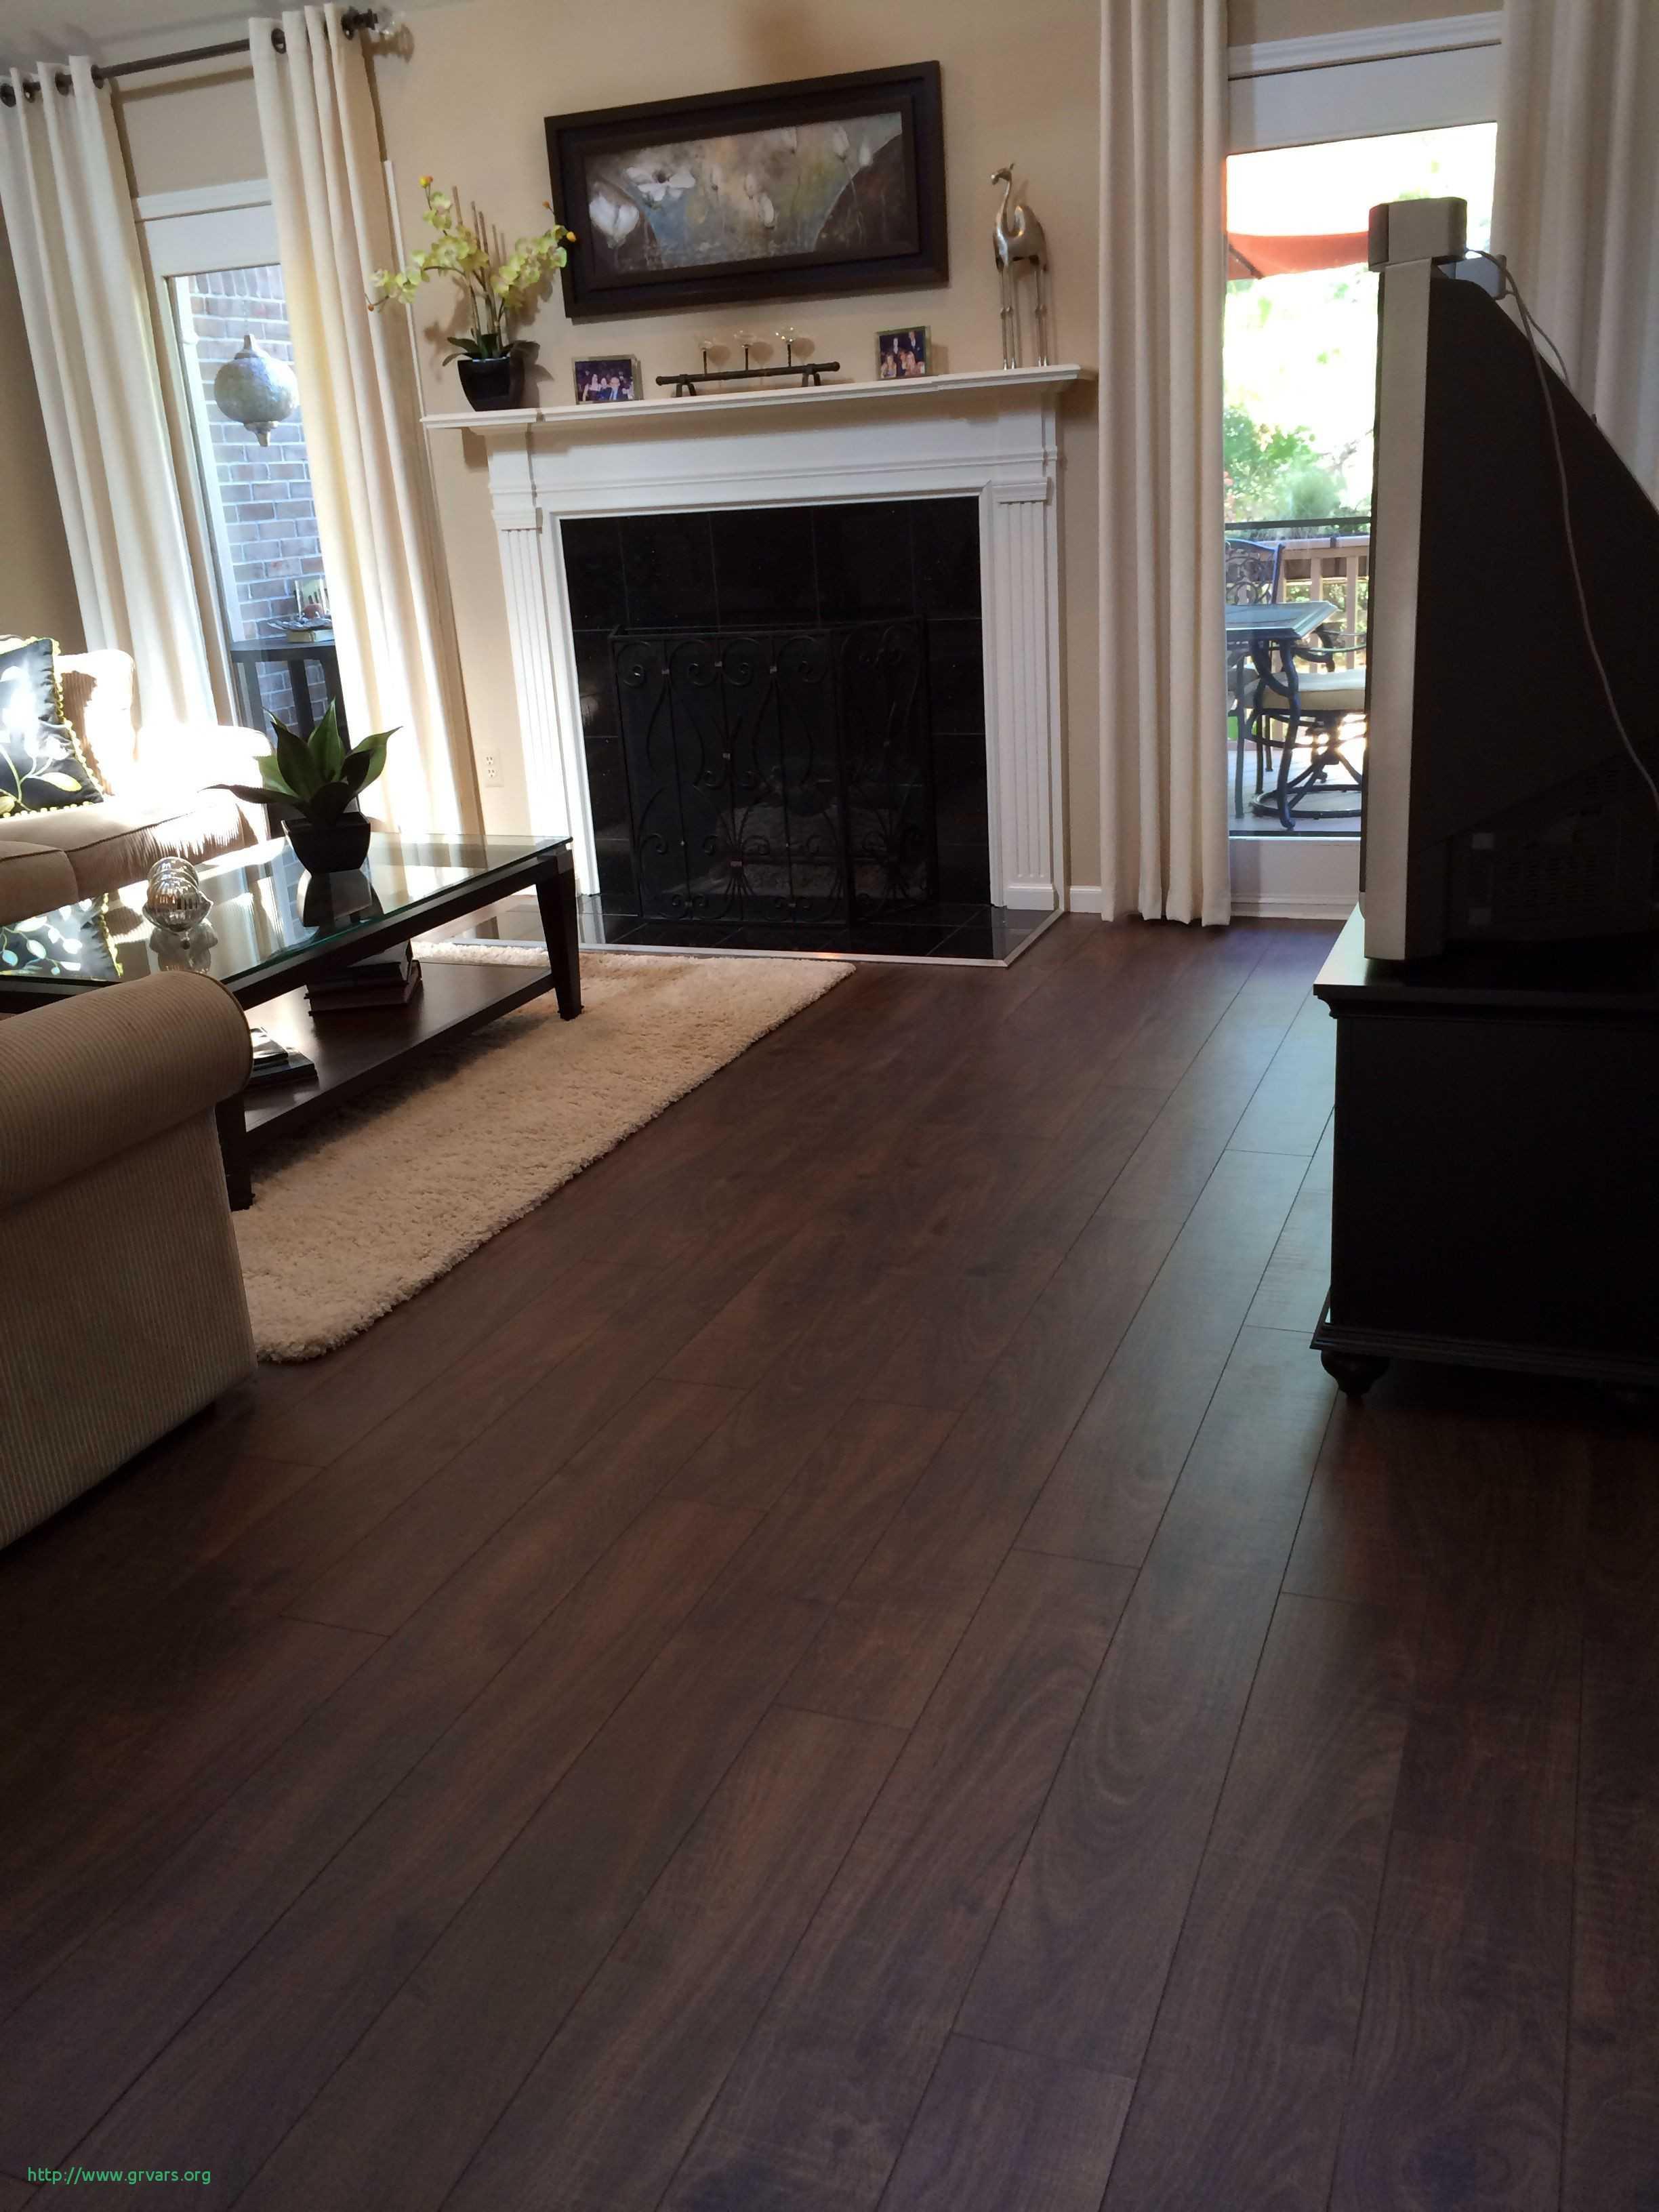 hardwood flooring questions of 19 meilleur de linolium floor ideas blog pertaining to light wood tile new decorating an open floor plan living room awesome design plan 0d